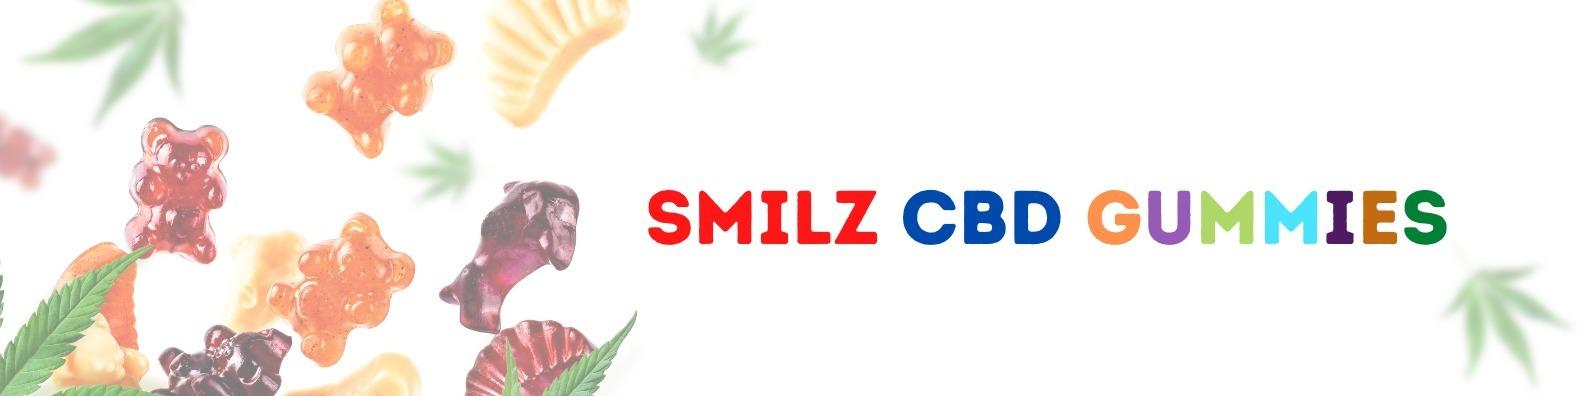 Smilz CBD Gummies (@usesmilzcbdgummies) Cover Image